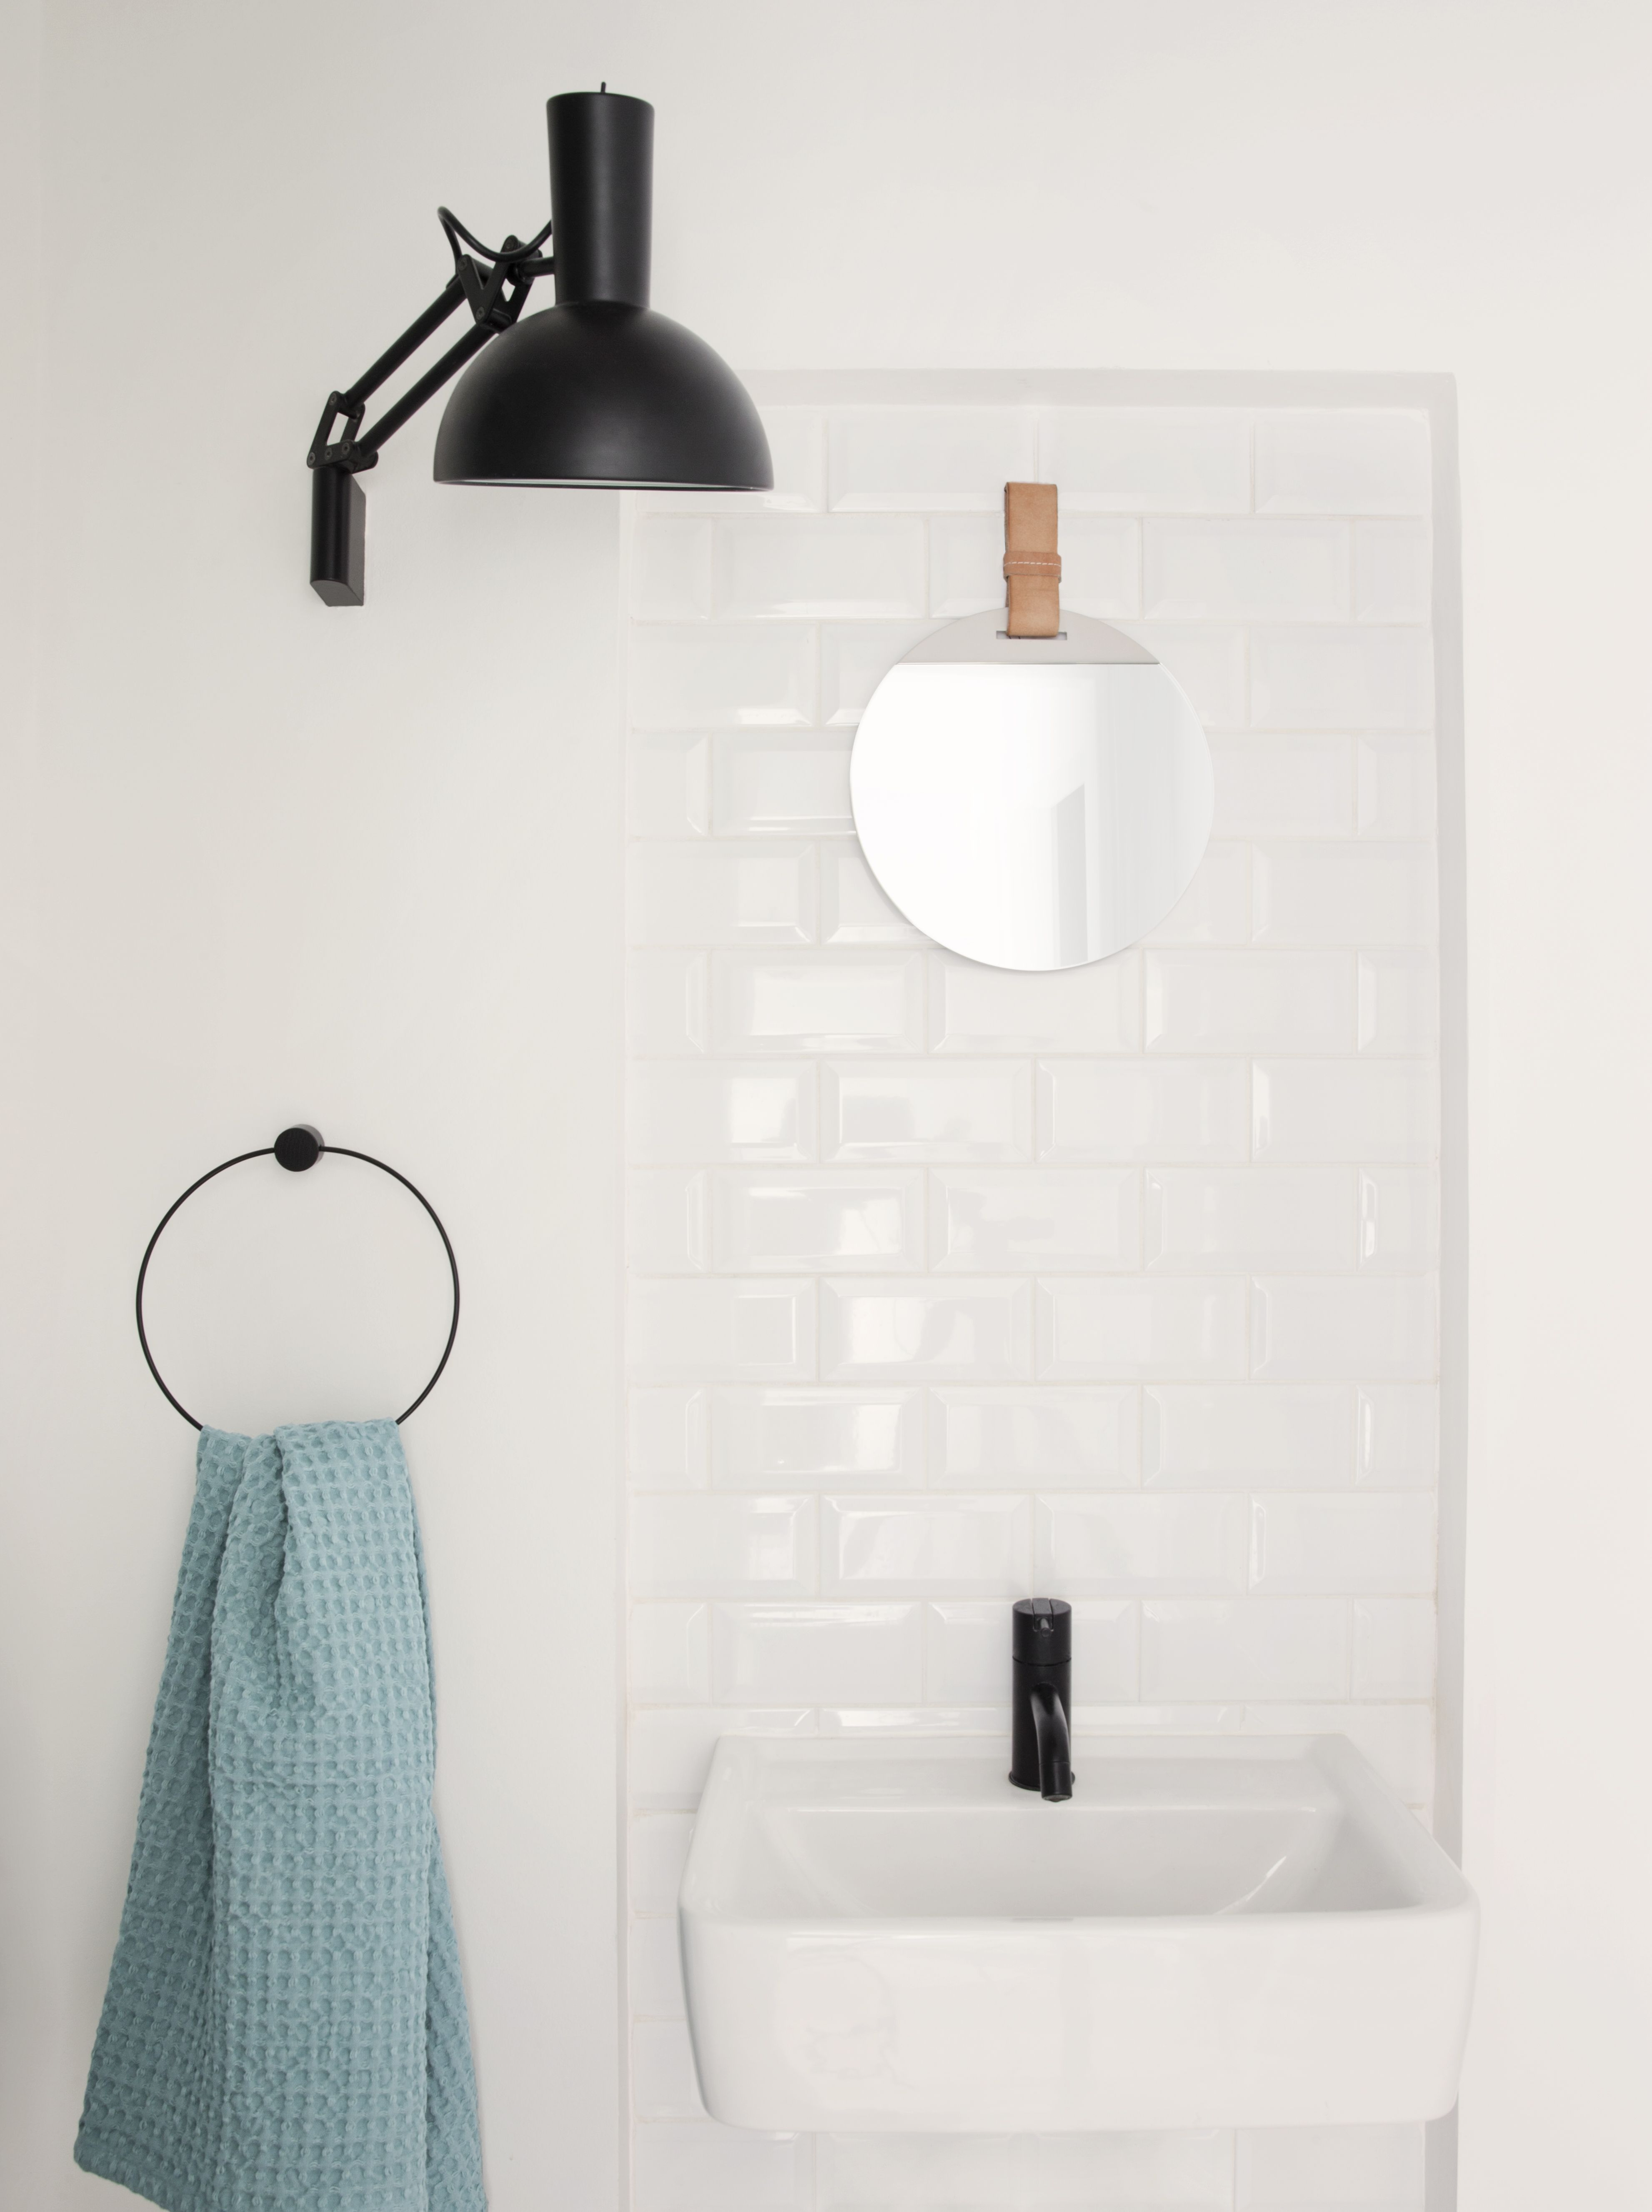 Black Towel Hanger design by Ferm Living - Wc, Badkamer en Badkamers